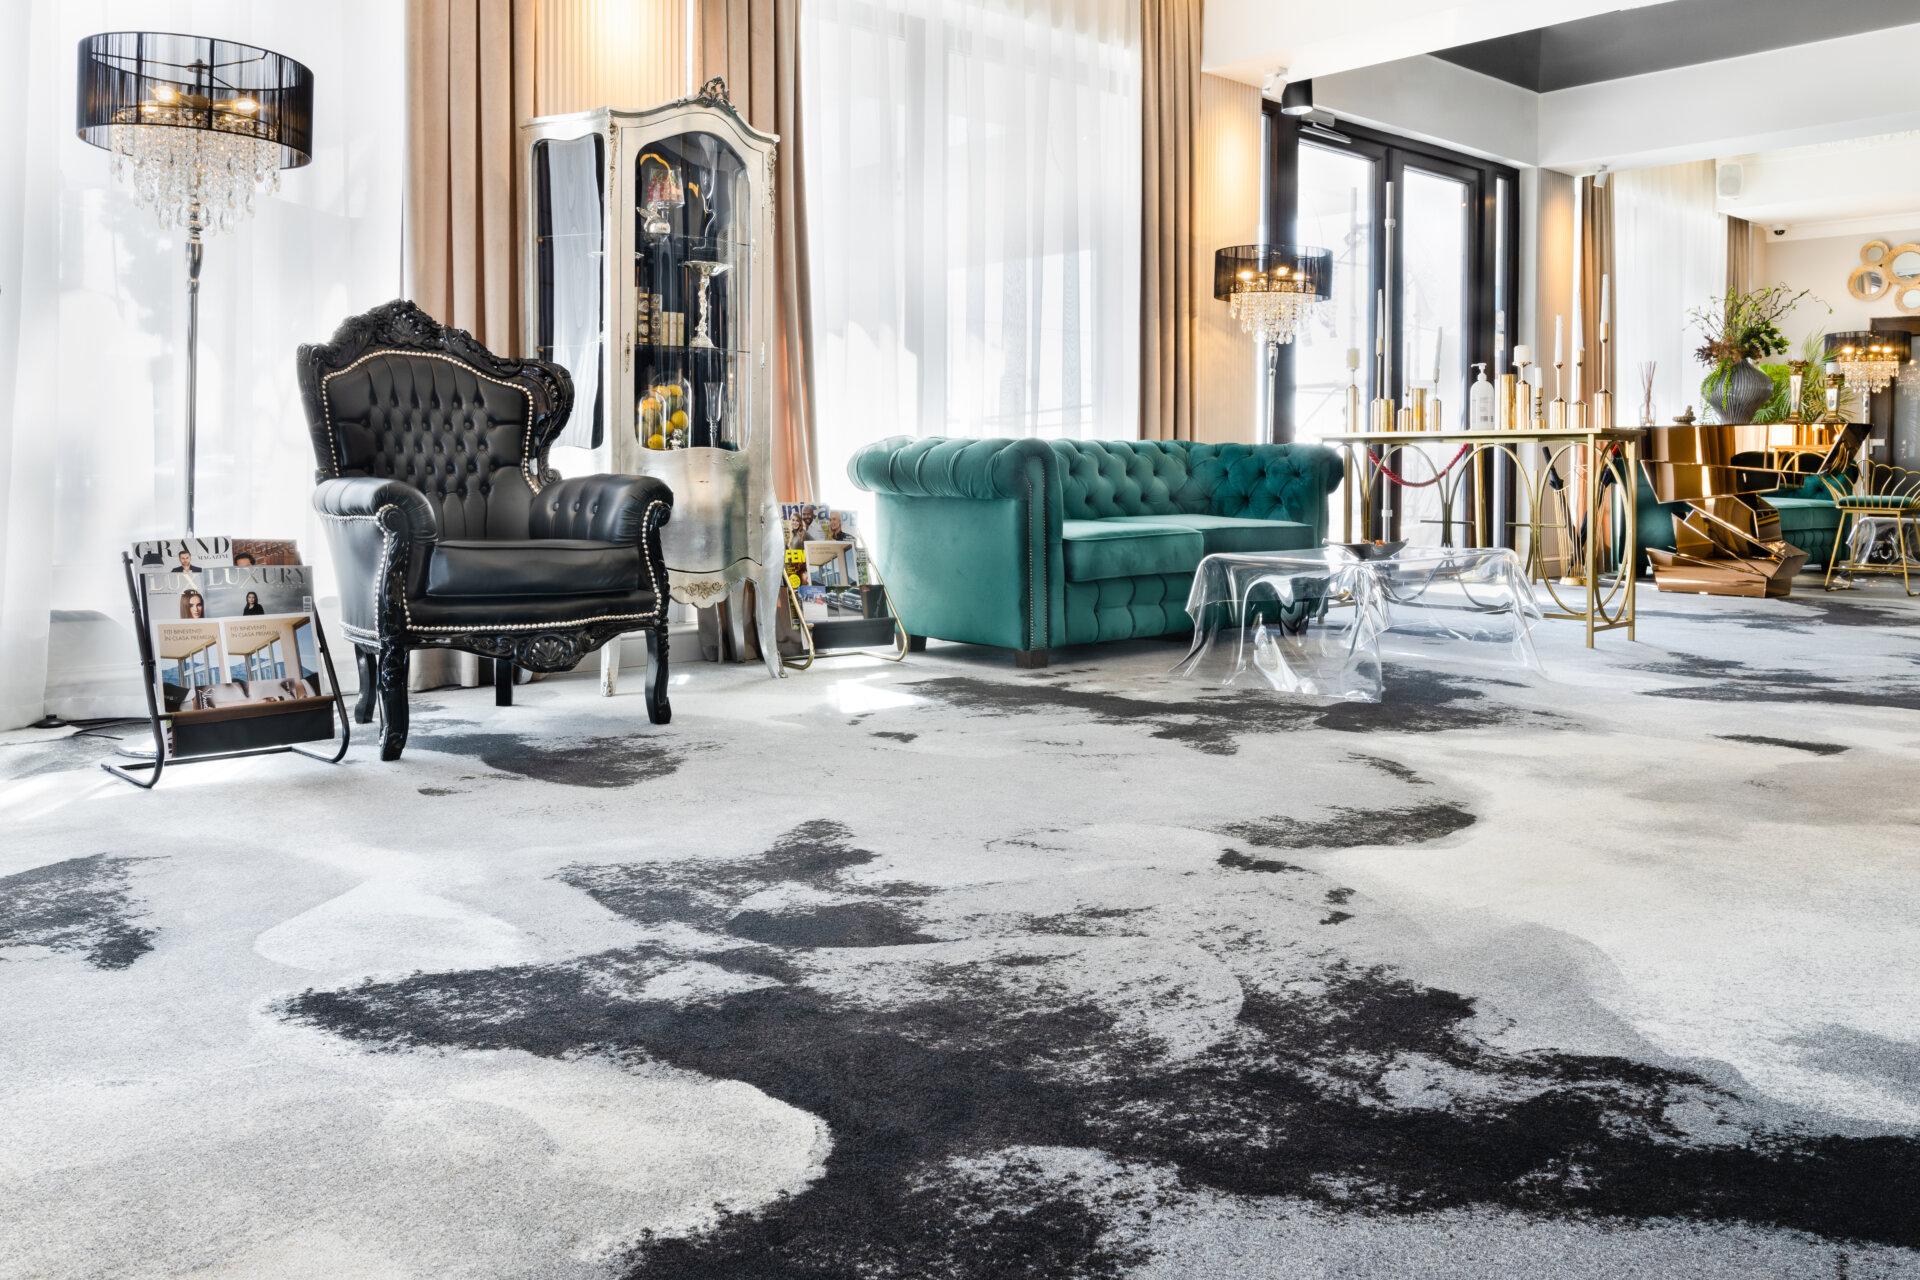 20210303-carpet&more-hotel-rocca-craiovaby-hugmedia-03